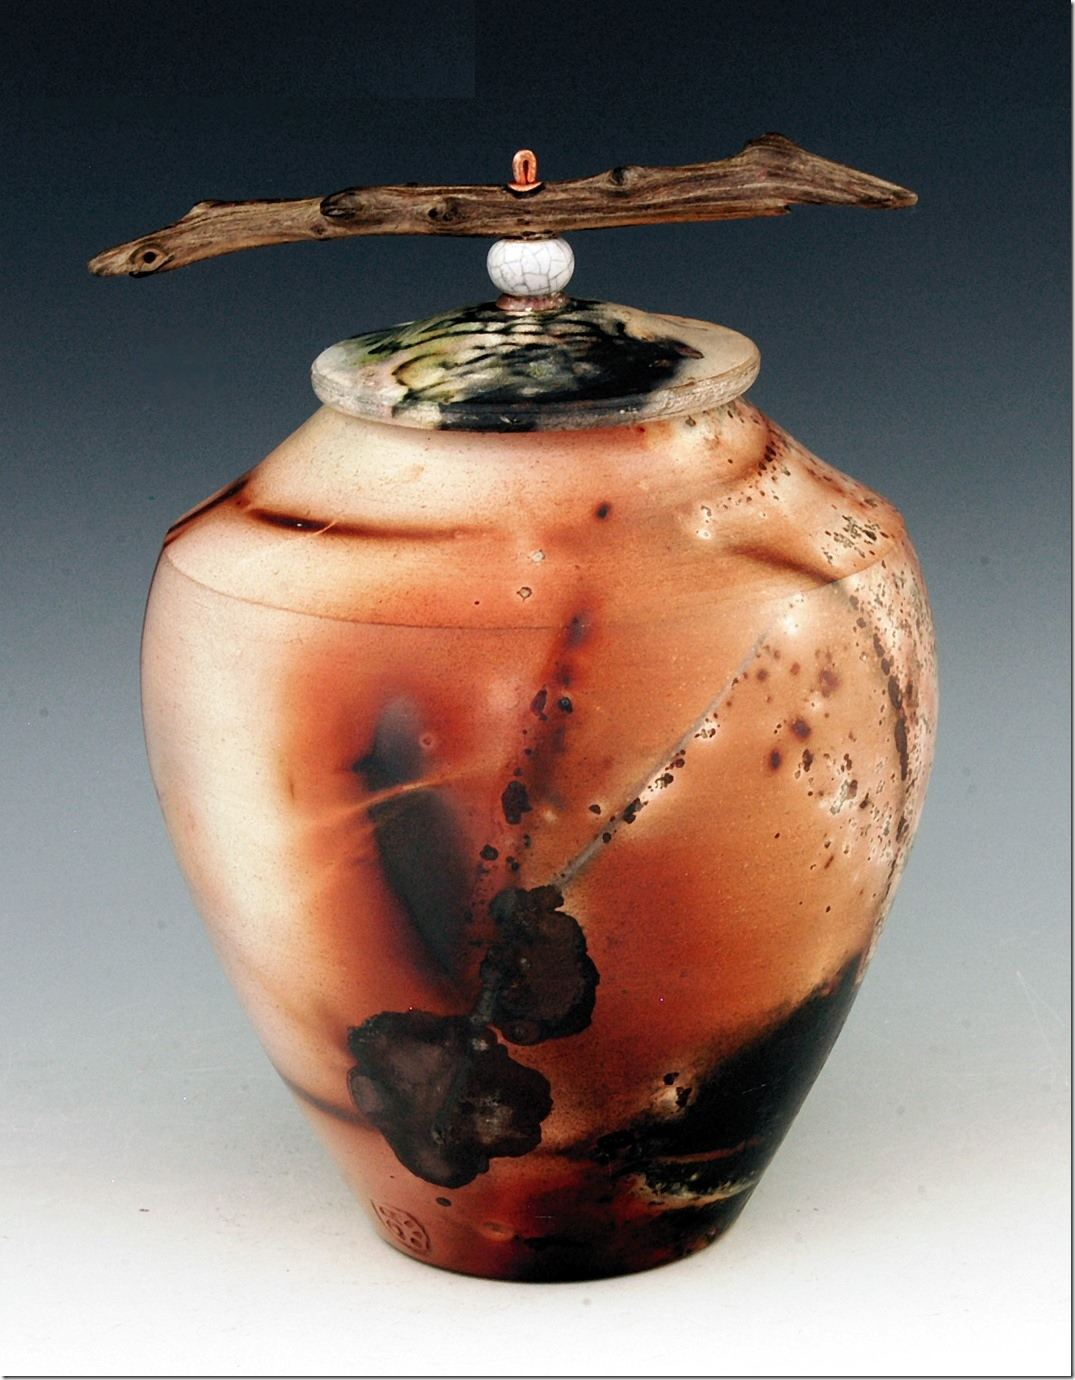 Afterglow Pet Cremation Urn